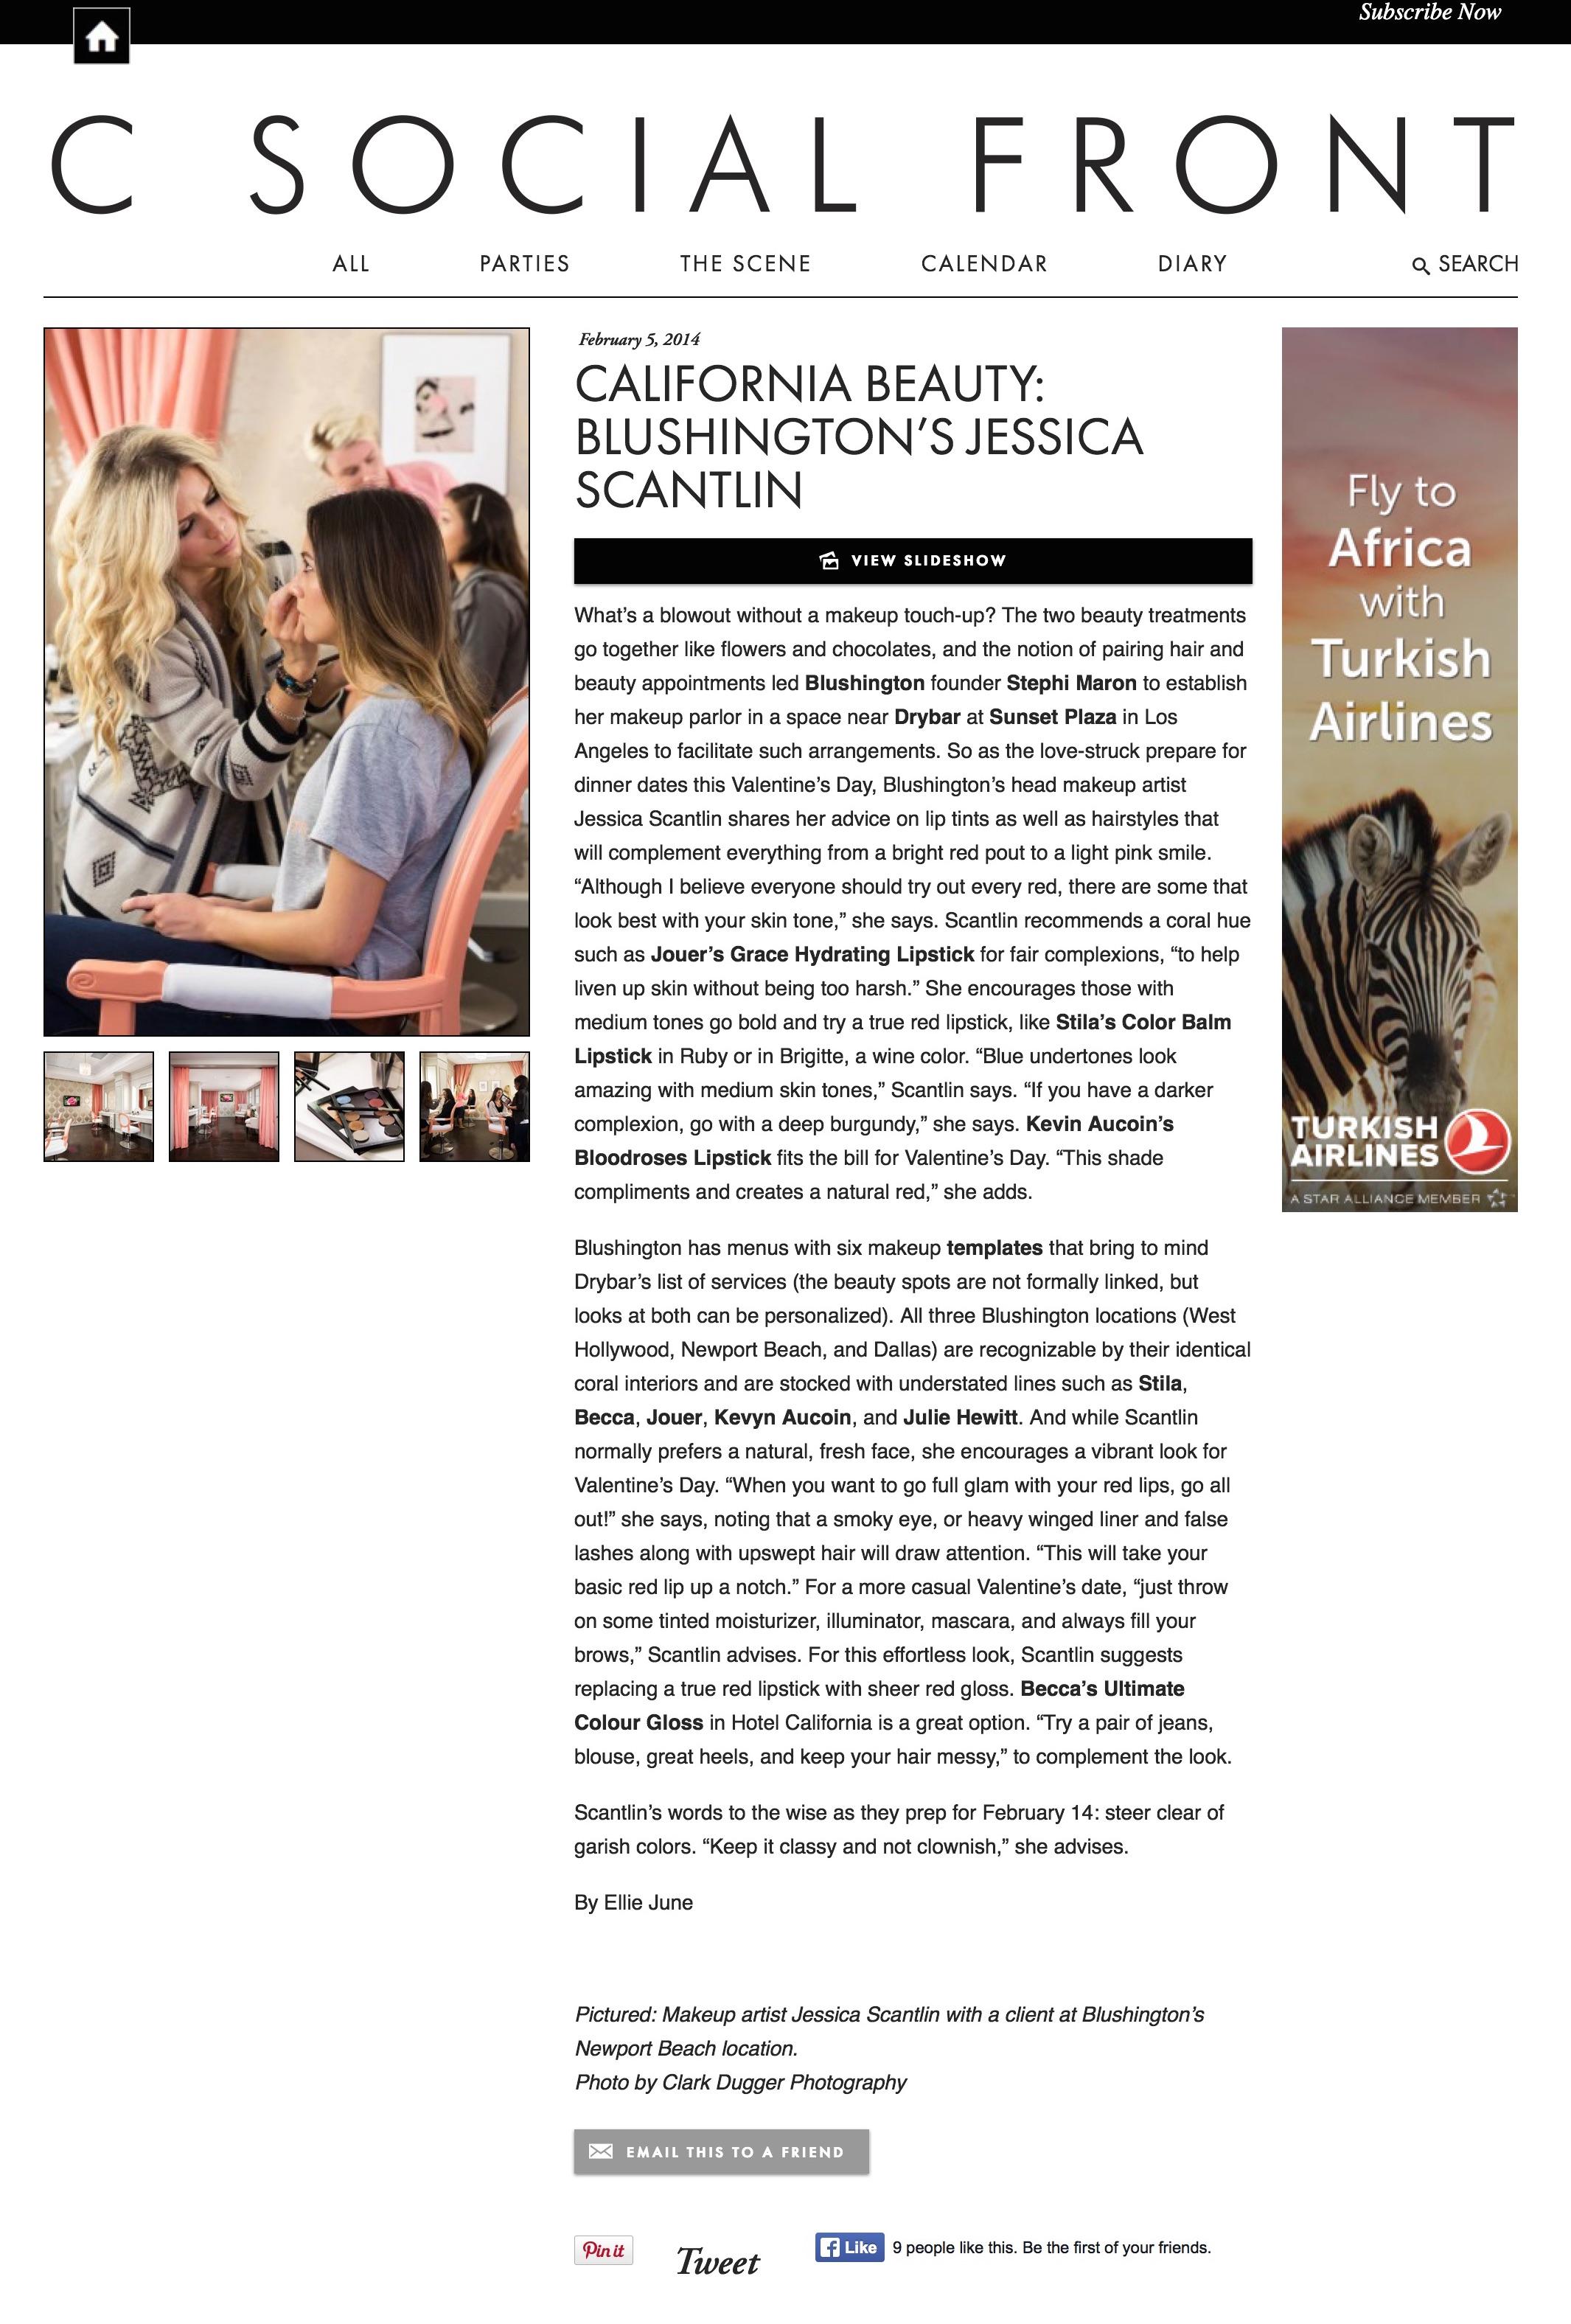 http---csocialfront.com-diary-california-beauty-blushingtons-jessica-scantlin (20150905).jpg